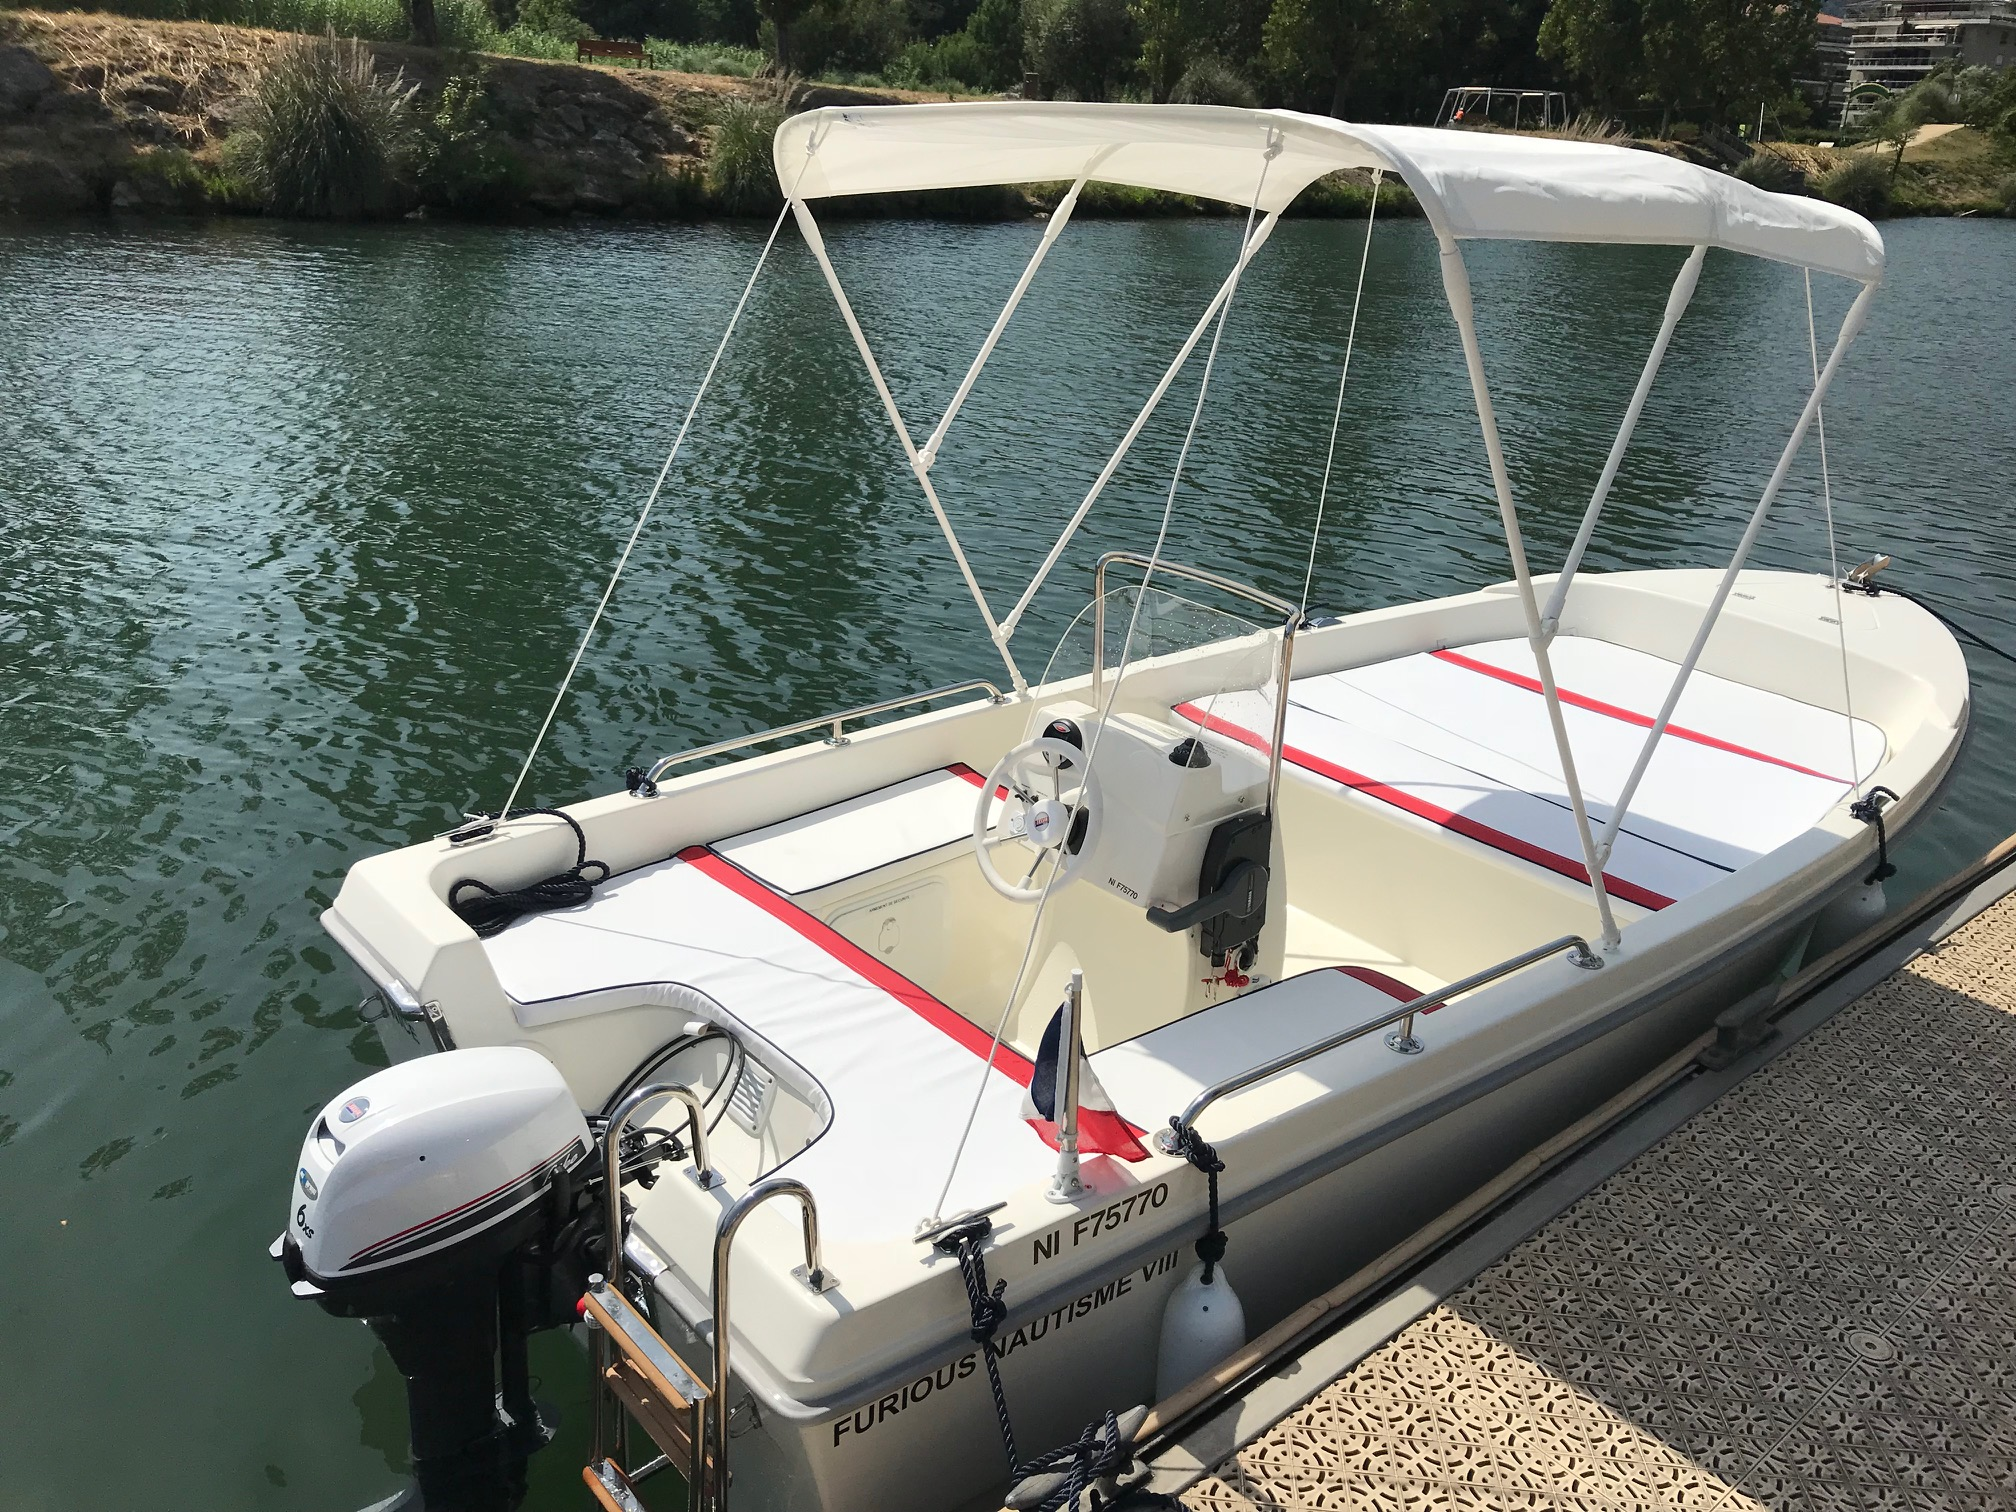 License-free boat - Half-day rentals